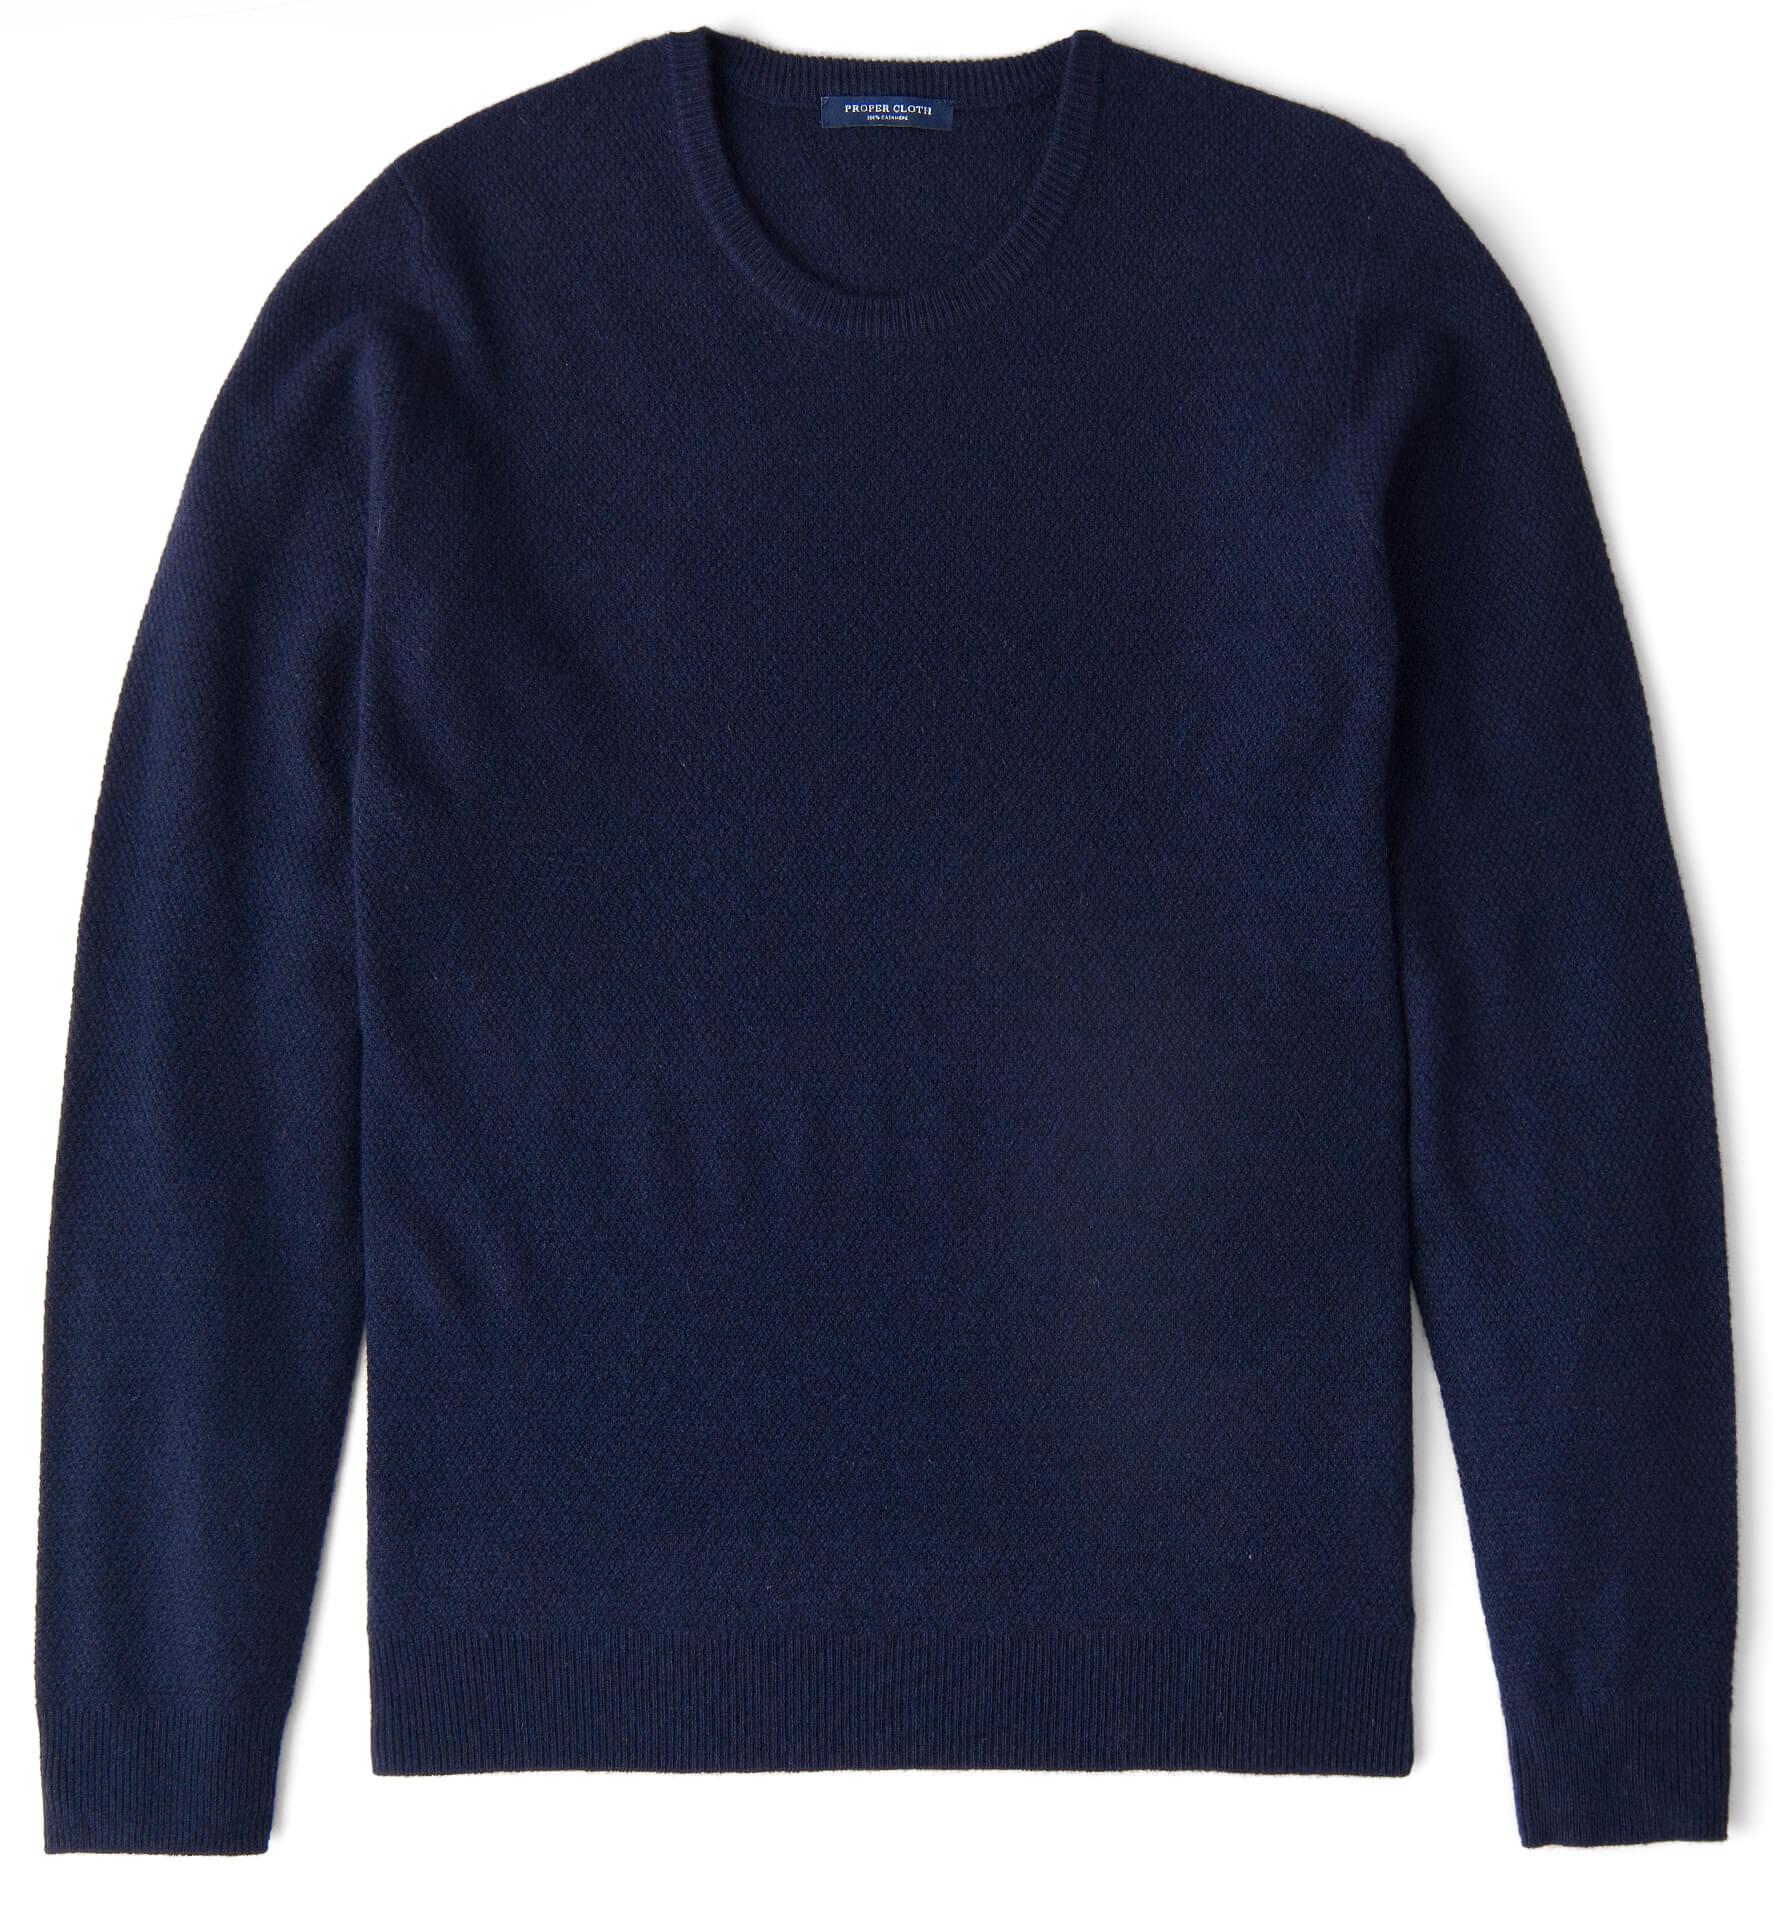 Zoom Image of Navy Cobble Stitch Cashmere Crewneck Sweater